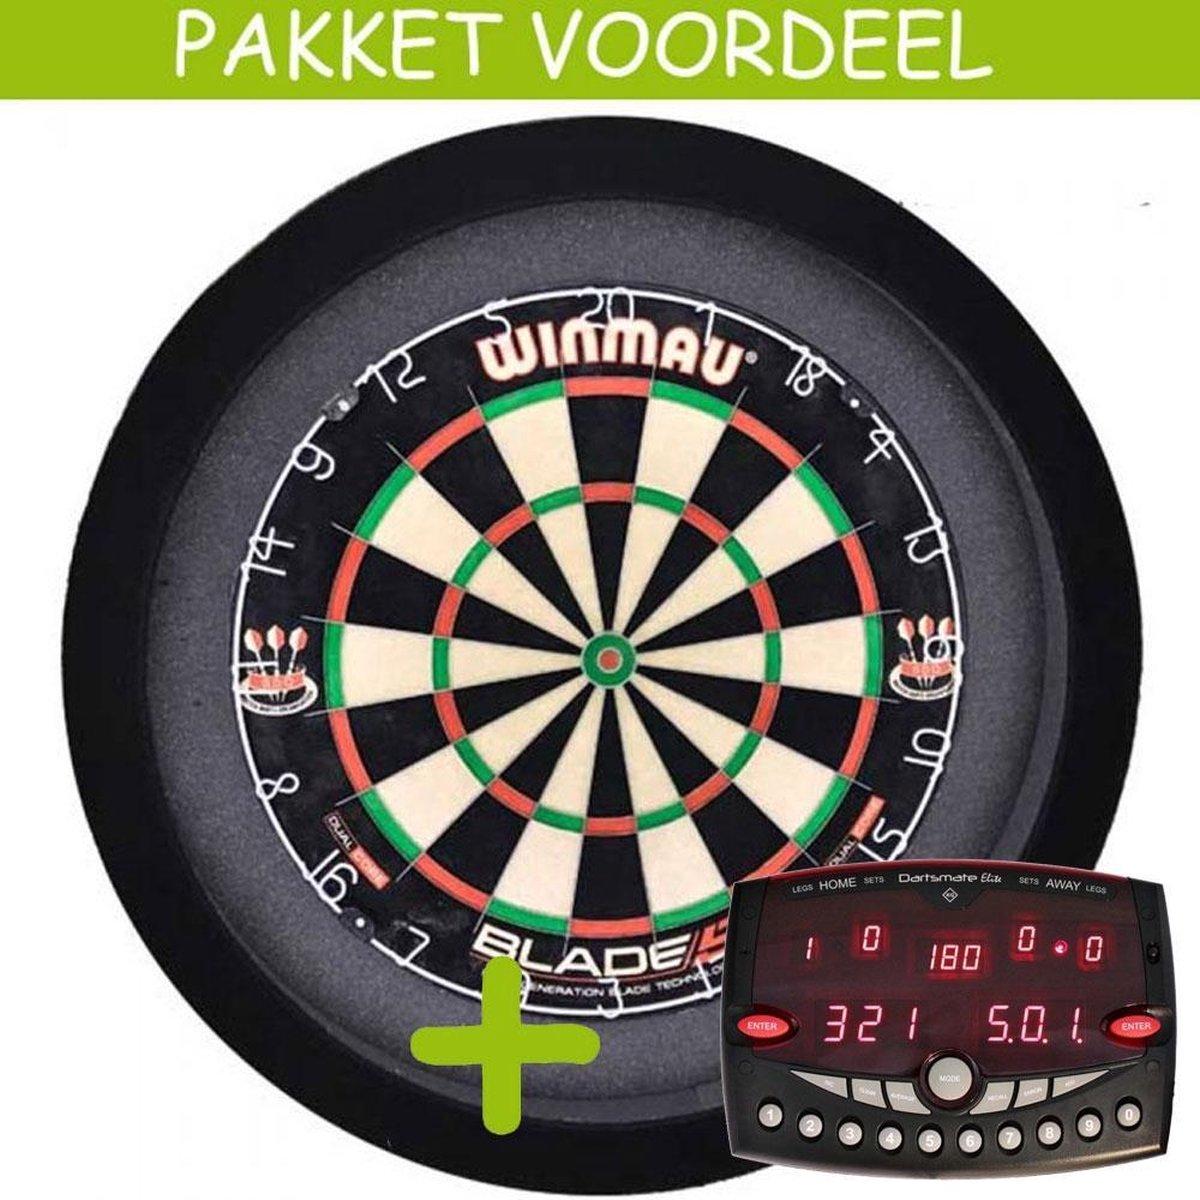 Elektronisch Dart Scorebord VoordeelPakket (Elite ) - Blade 5 - Dartbordverlichting Basic (Zwart)